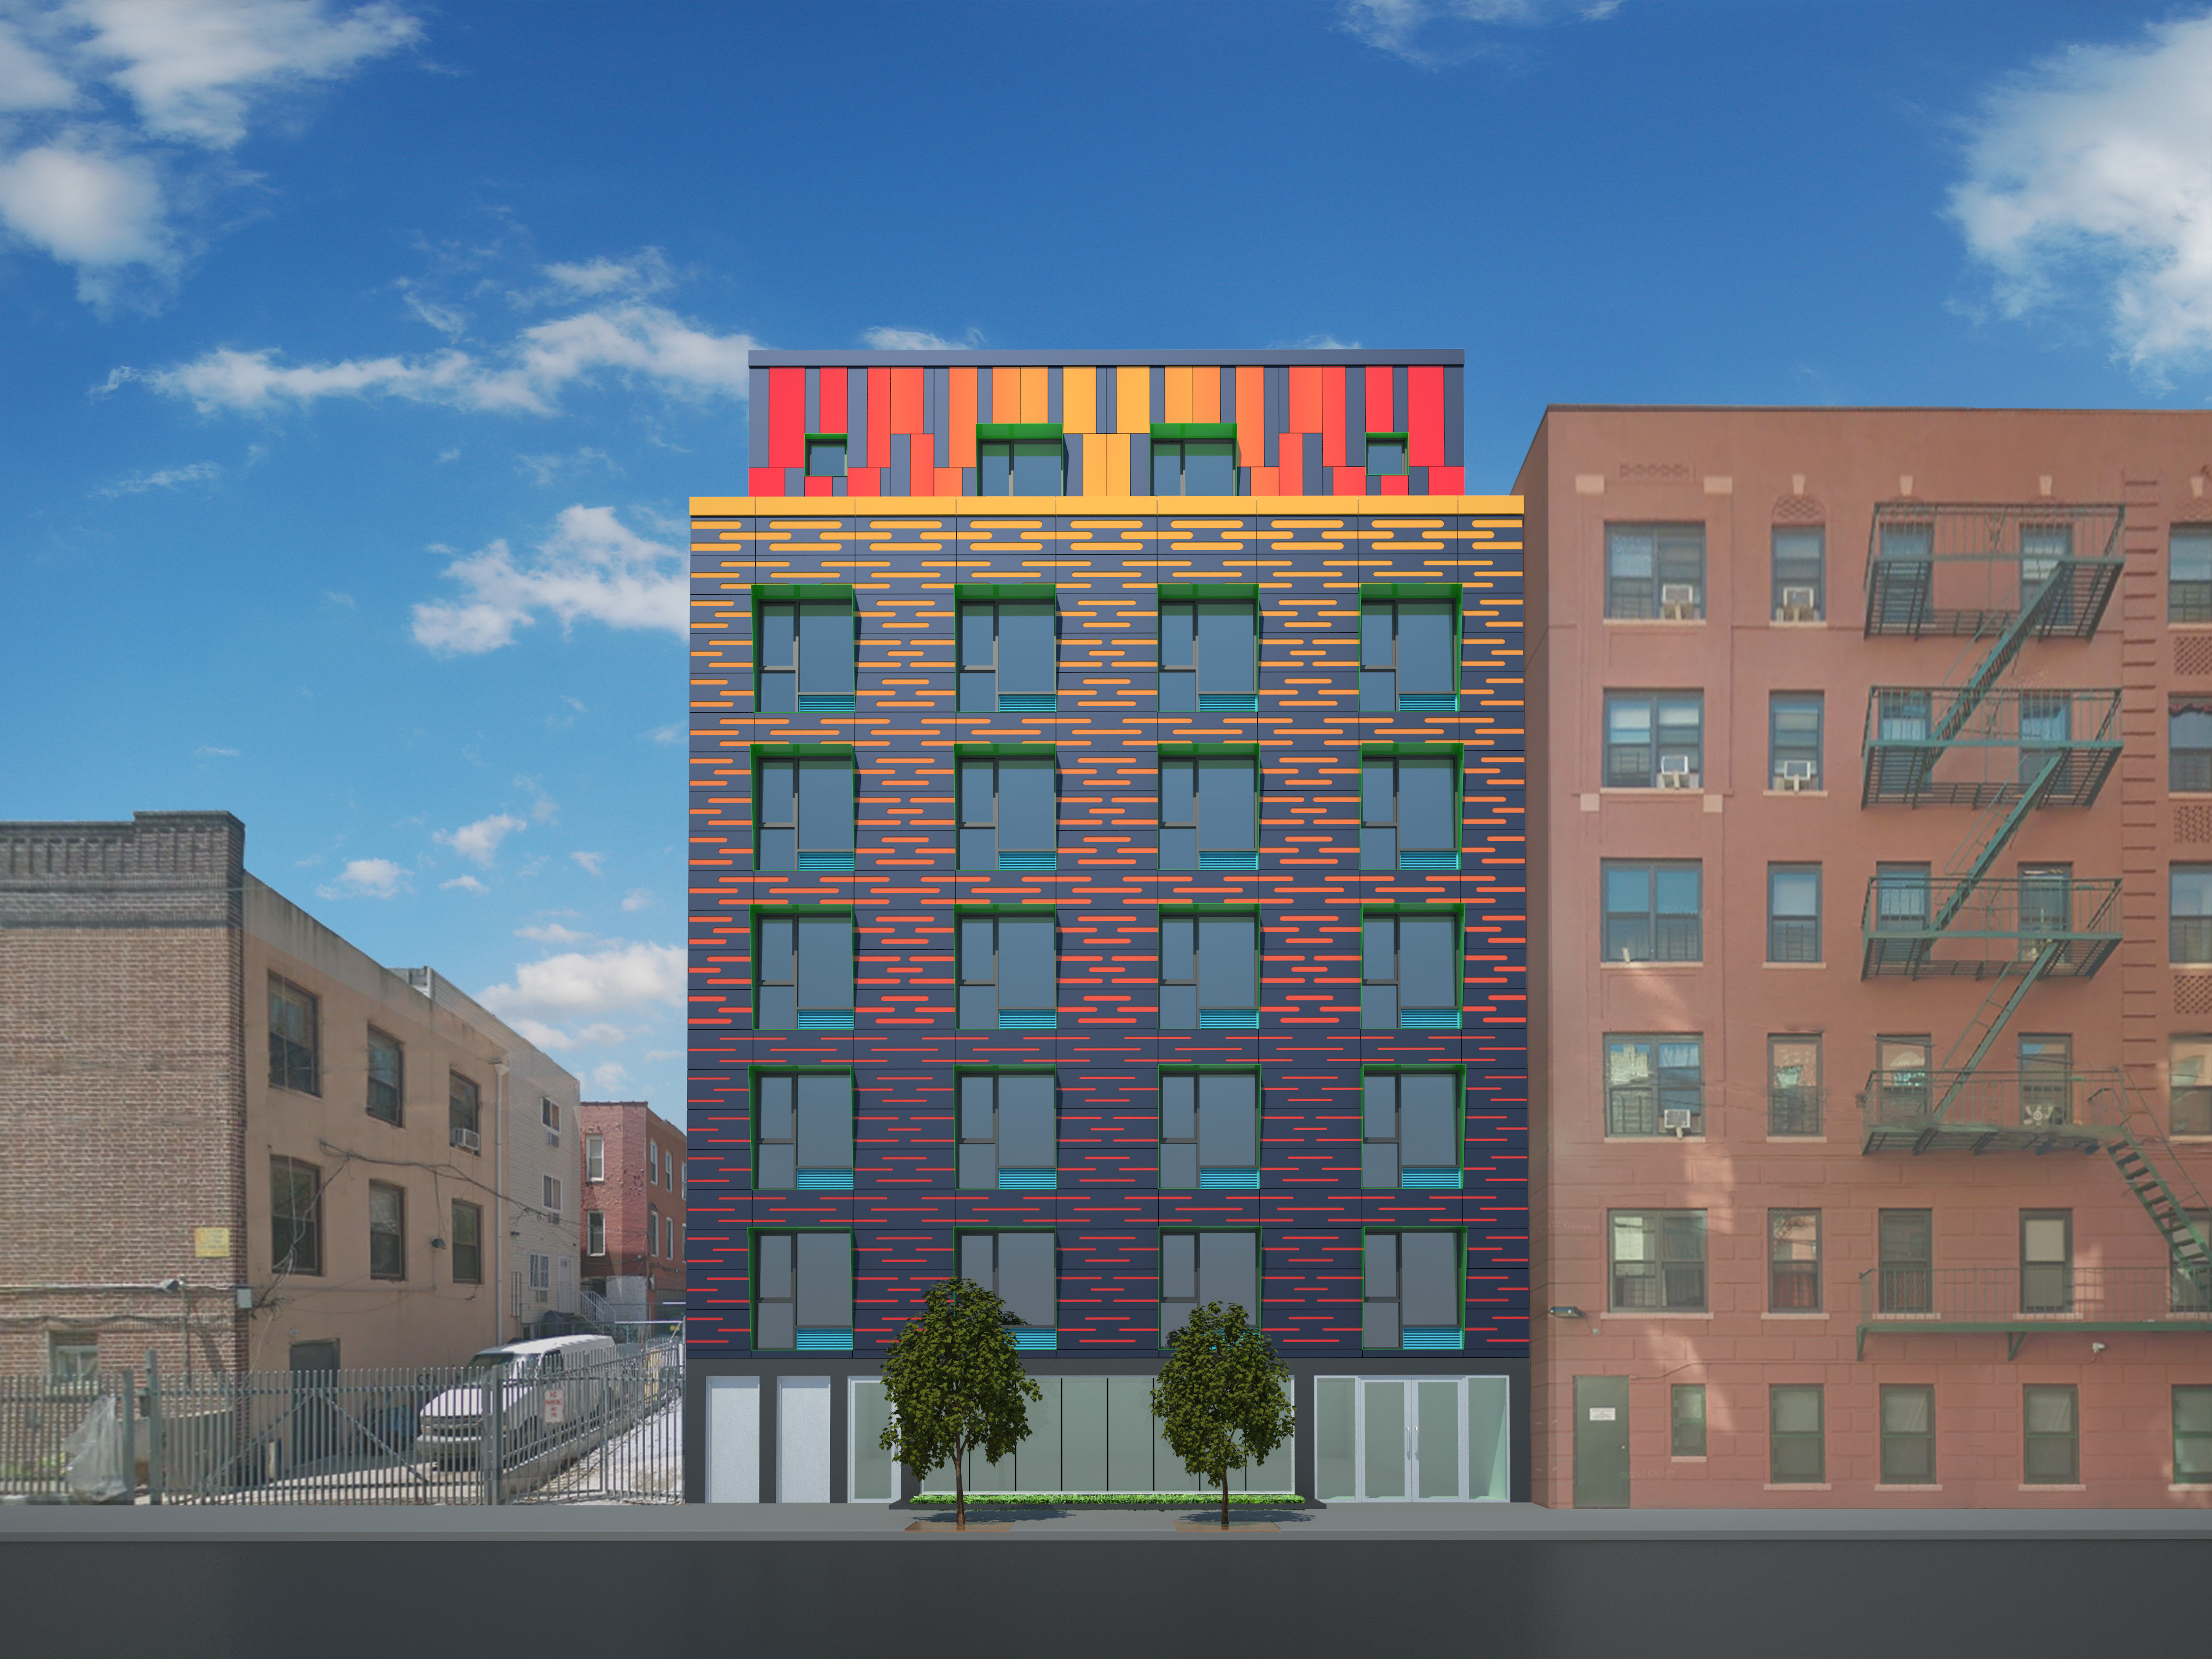 883 Bryant Avenue, rendering from Ari Thaler